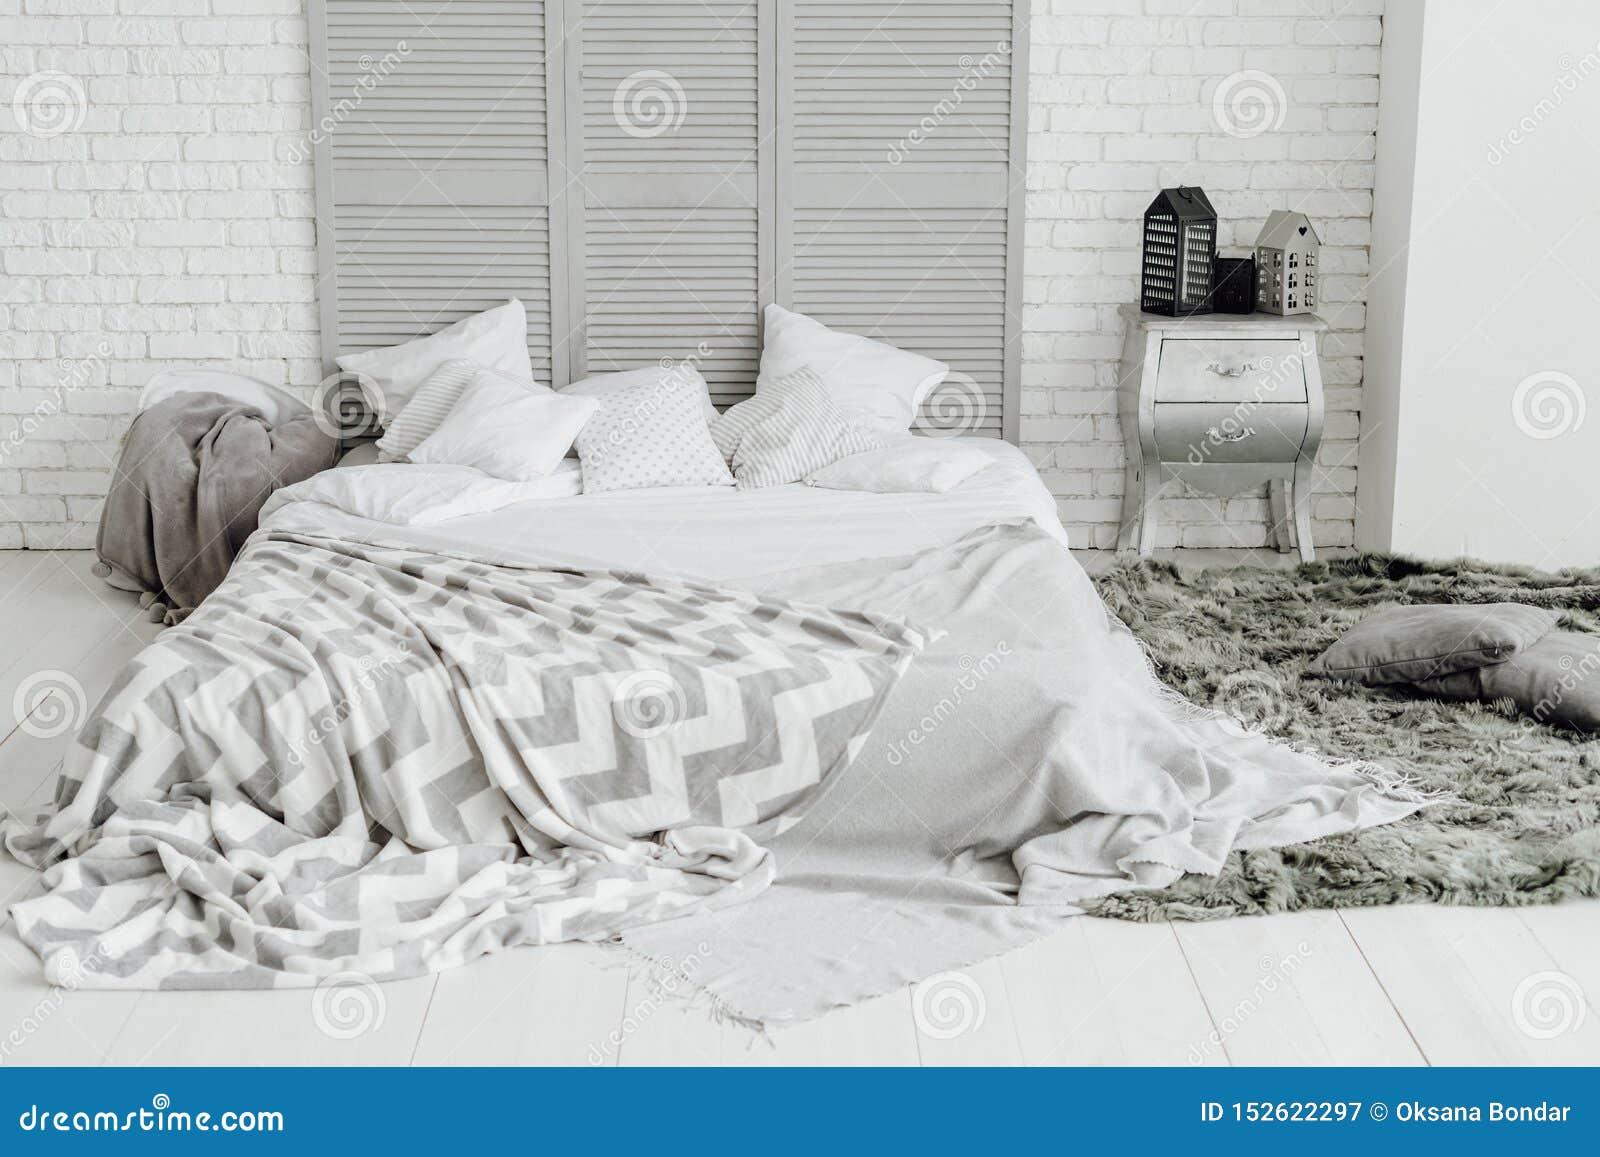 Cozy Grey Bedroom Interior Spacious Room Design Stock Image Image Of Messy Luxury 152622297